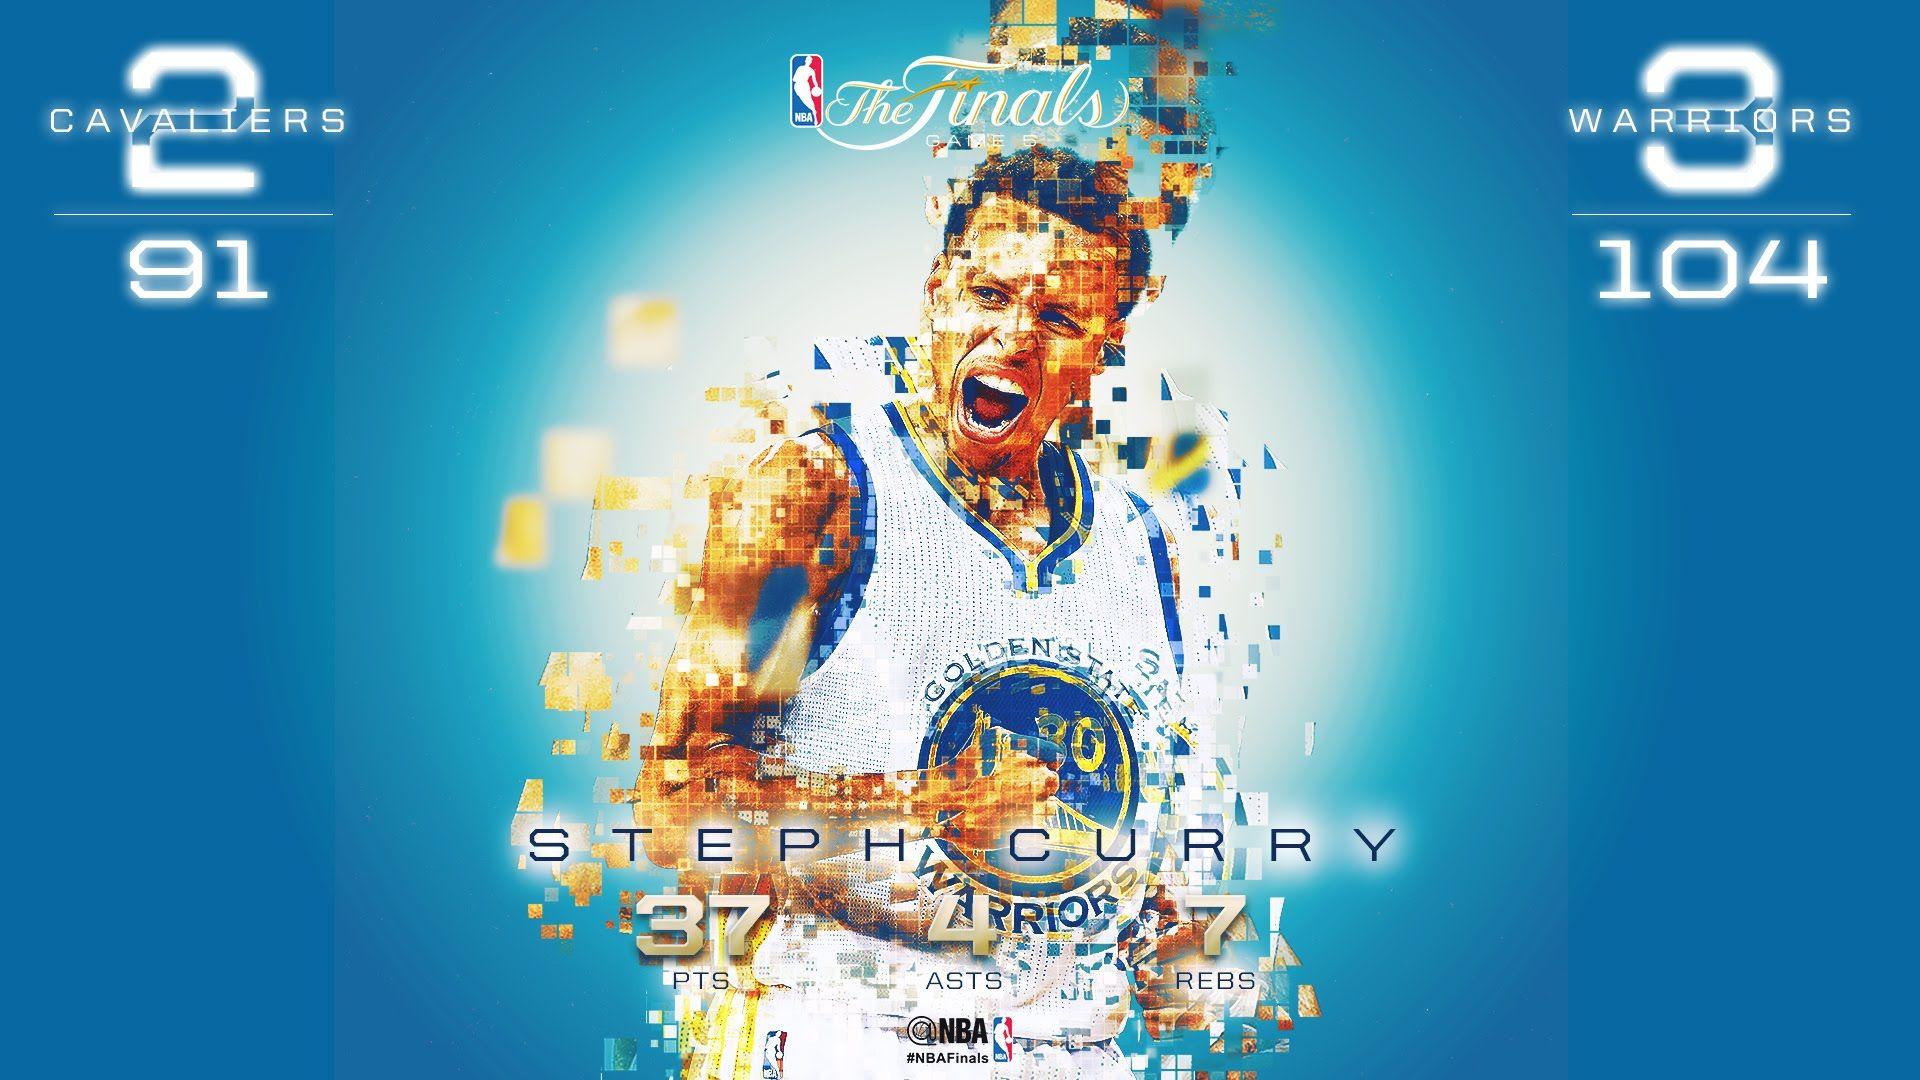 Miami Heat Wallpaper Iphone X Basketball Nba Wallpapers Pixelstalk Net